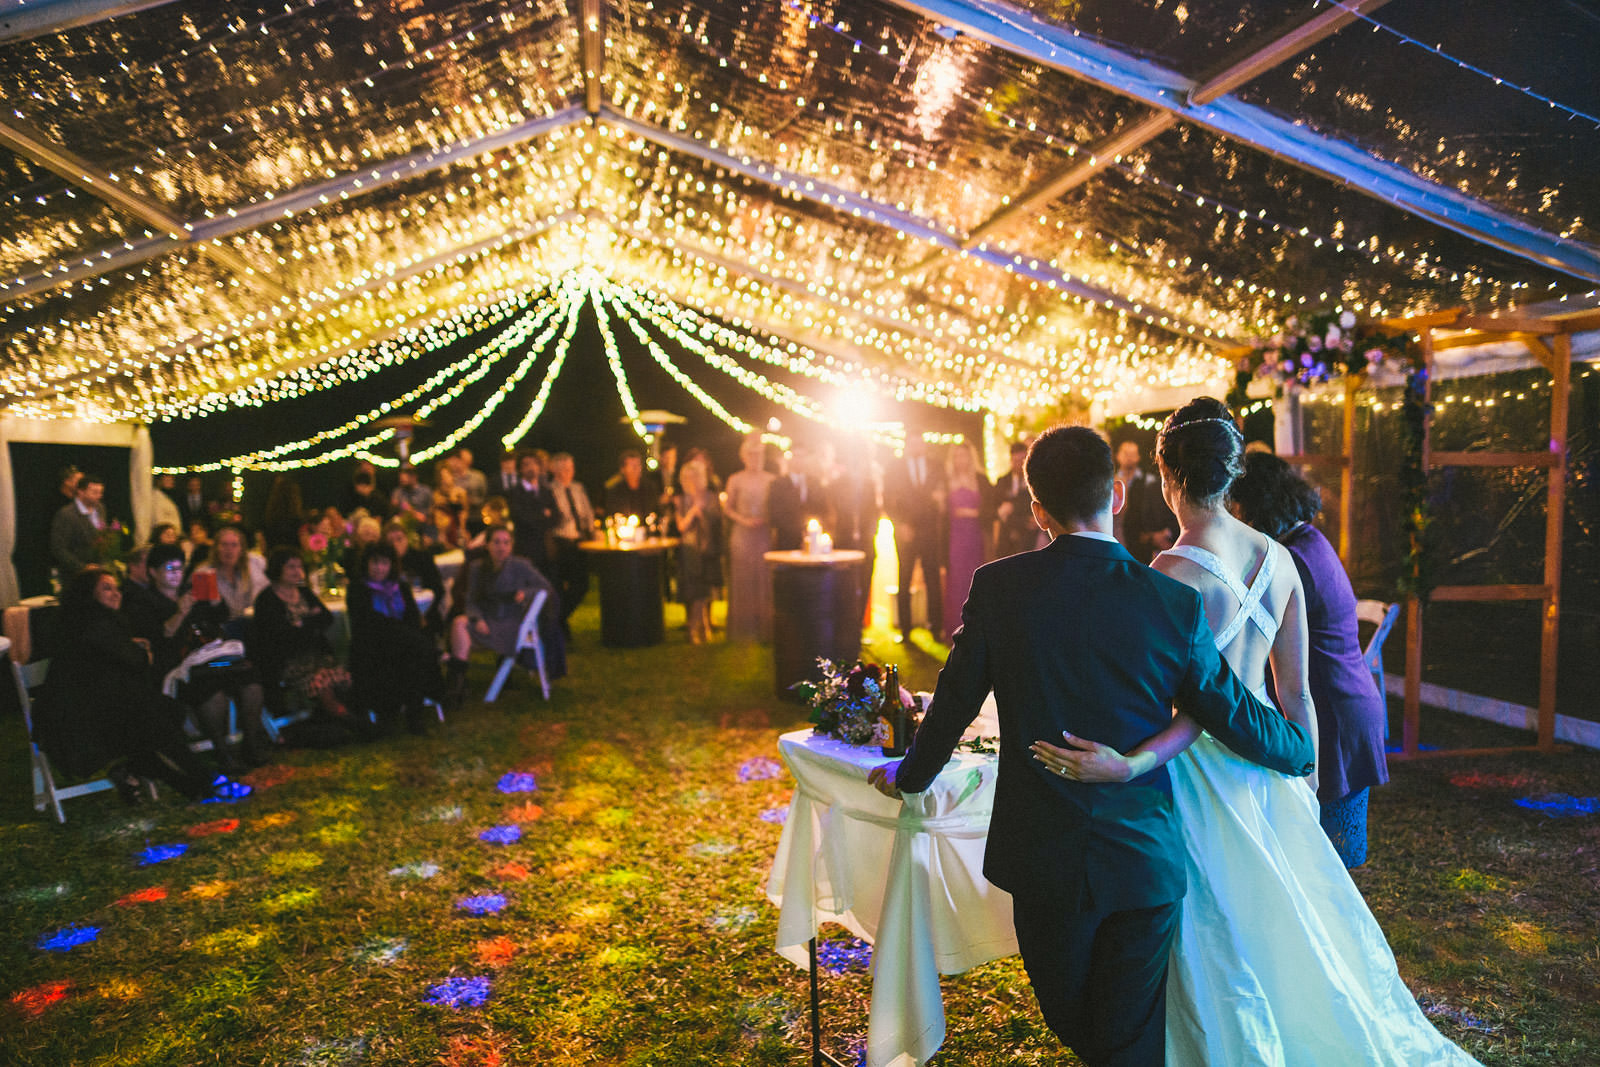 tablelands_wedding_0058